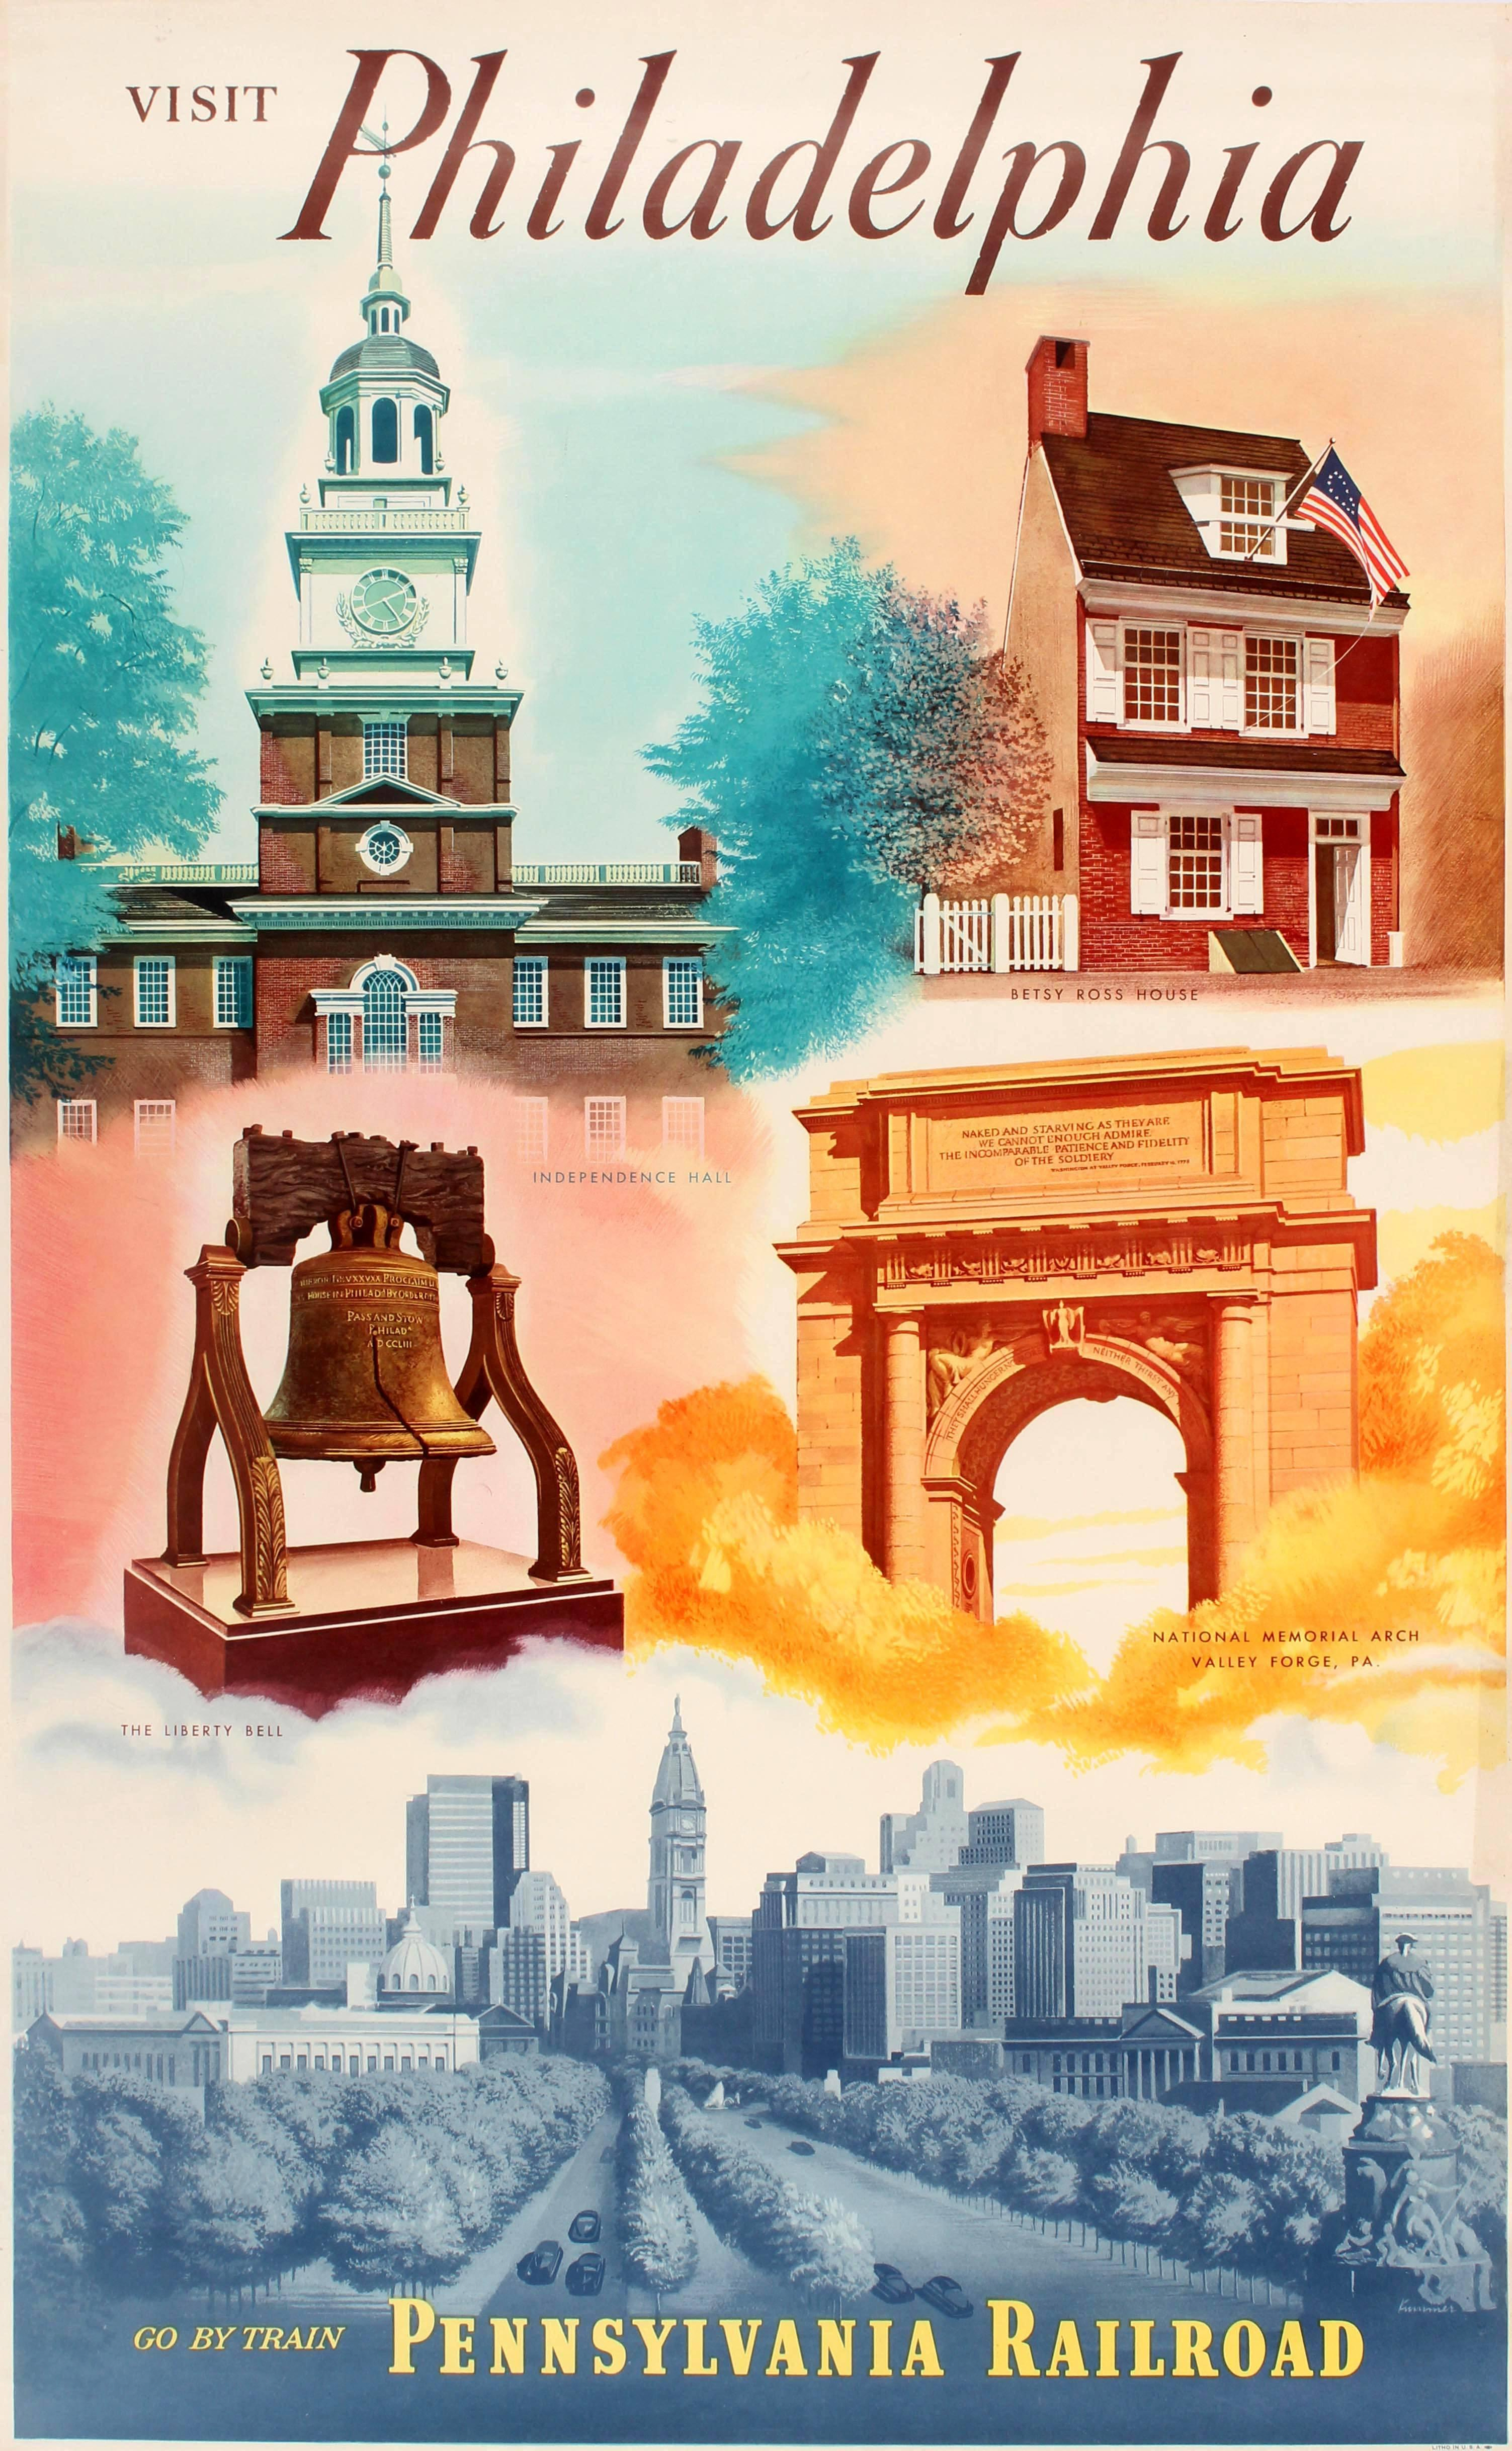 Original Vintage Pennsylvania Railroad Poster - Visit Philadelphia - Go By Train